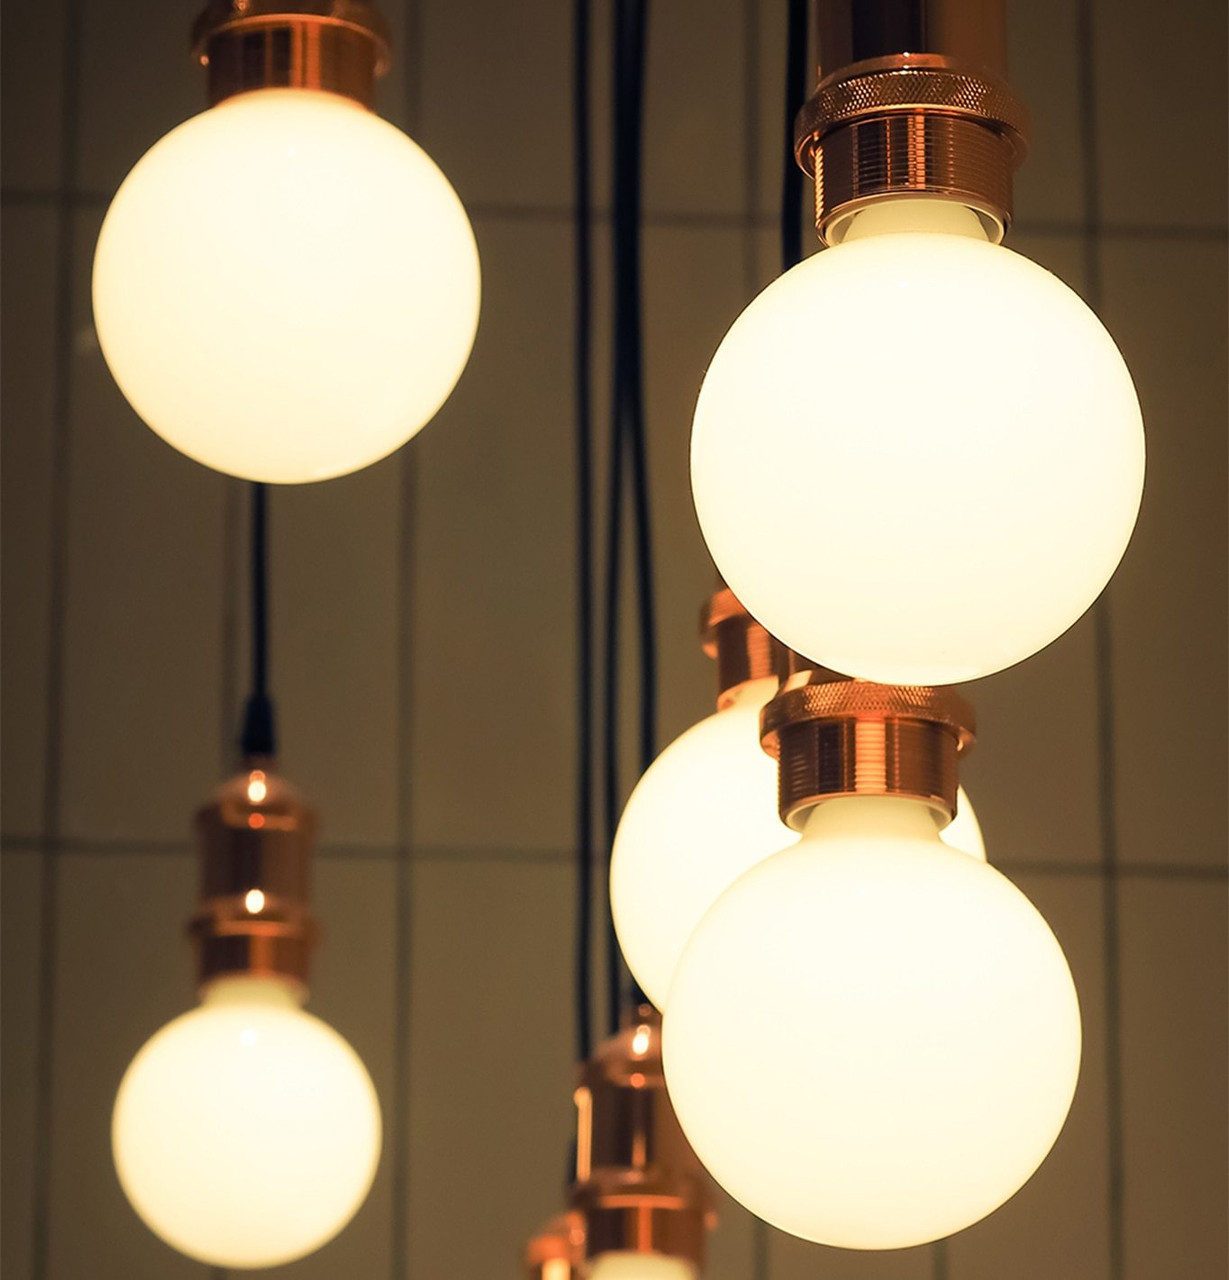 Crompton Lamps LED G80 Antique Bronze Light Bulbs